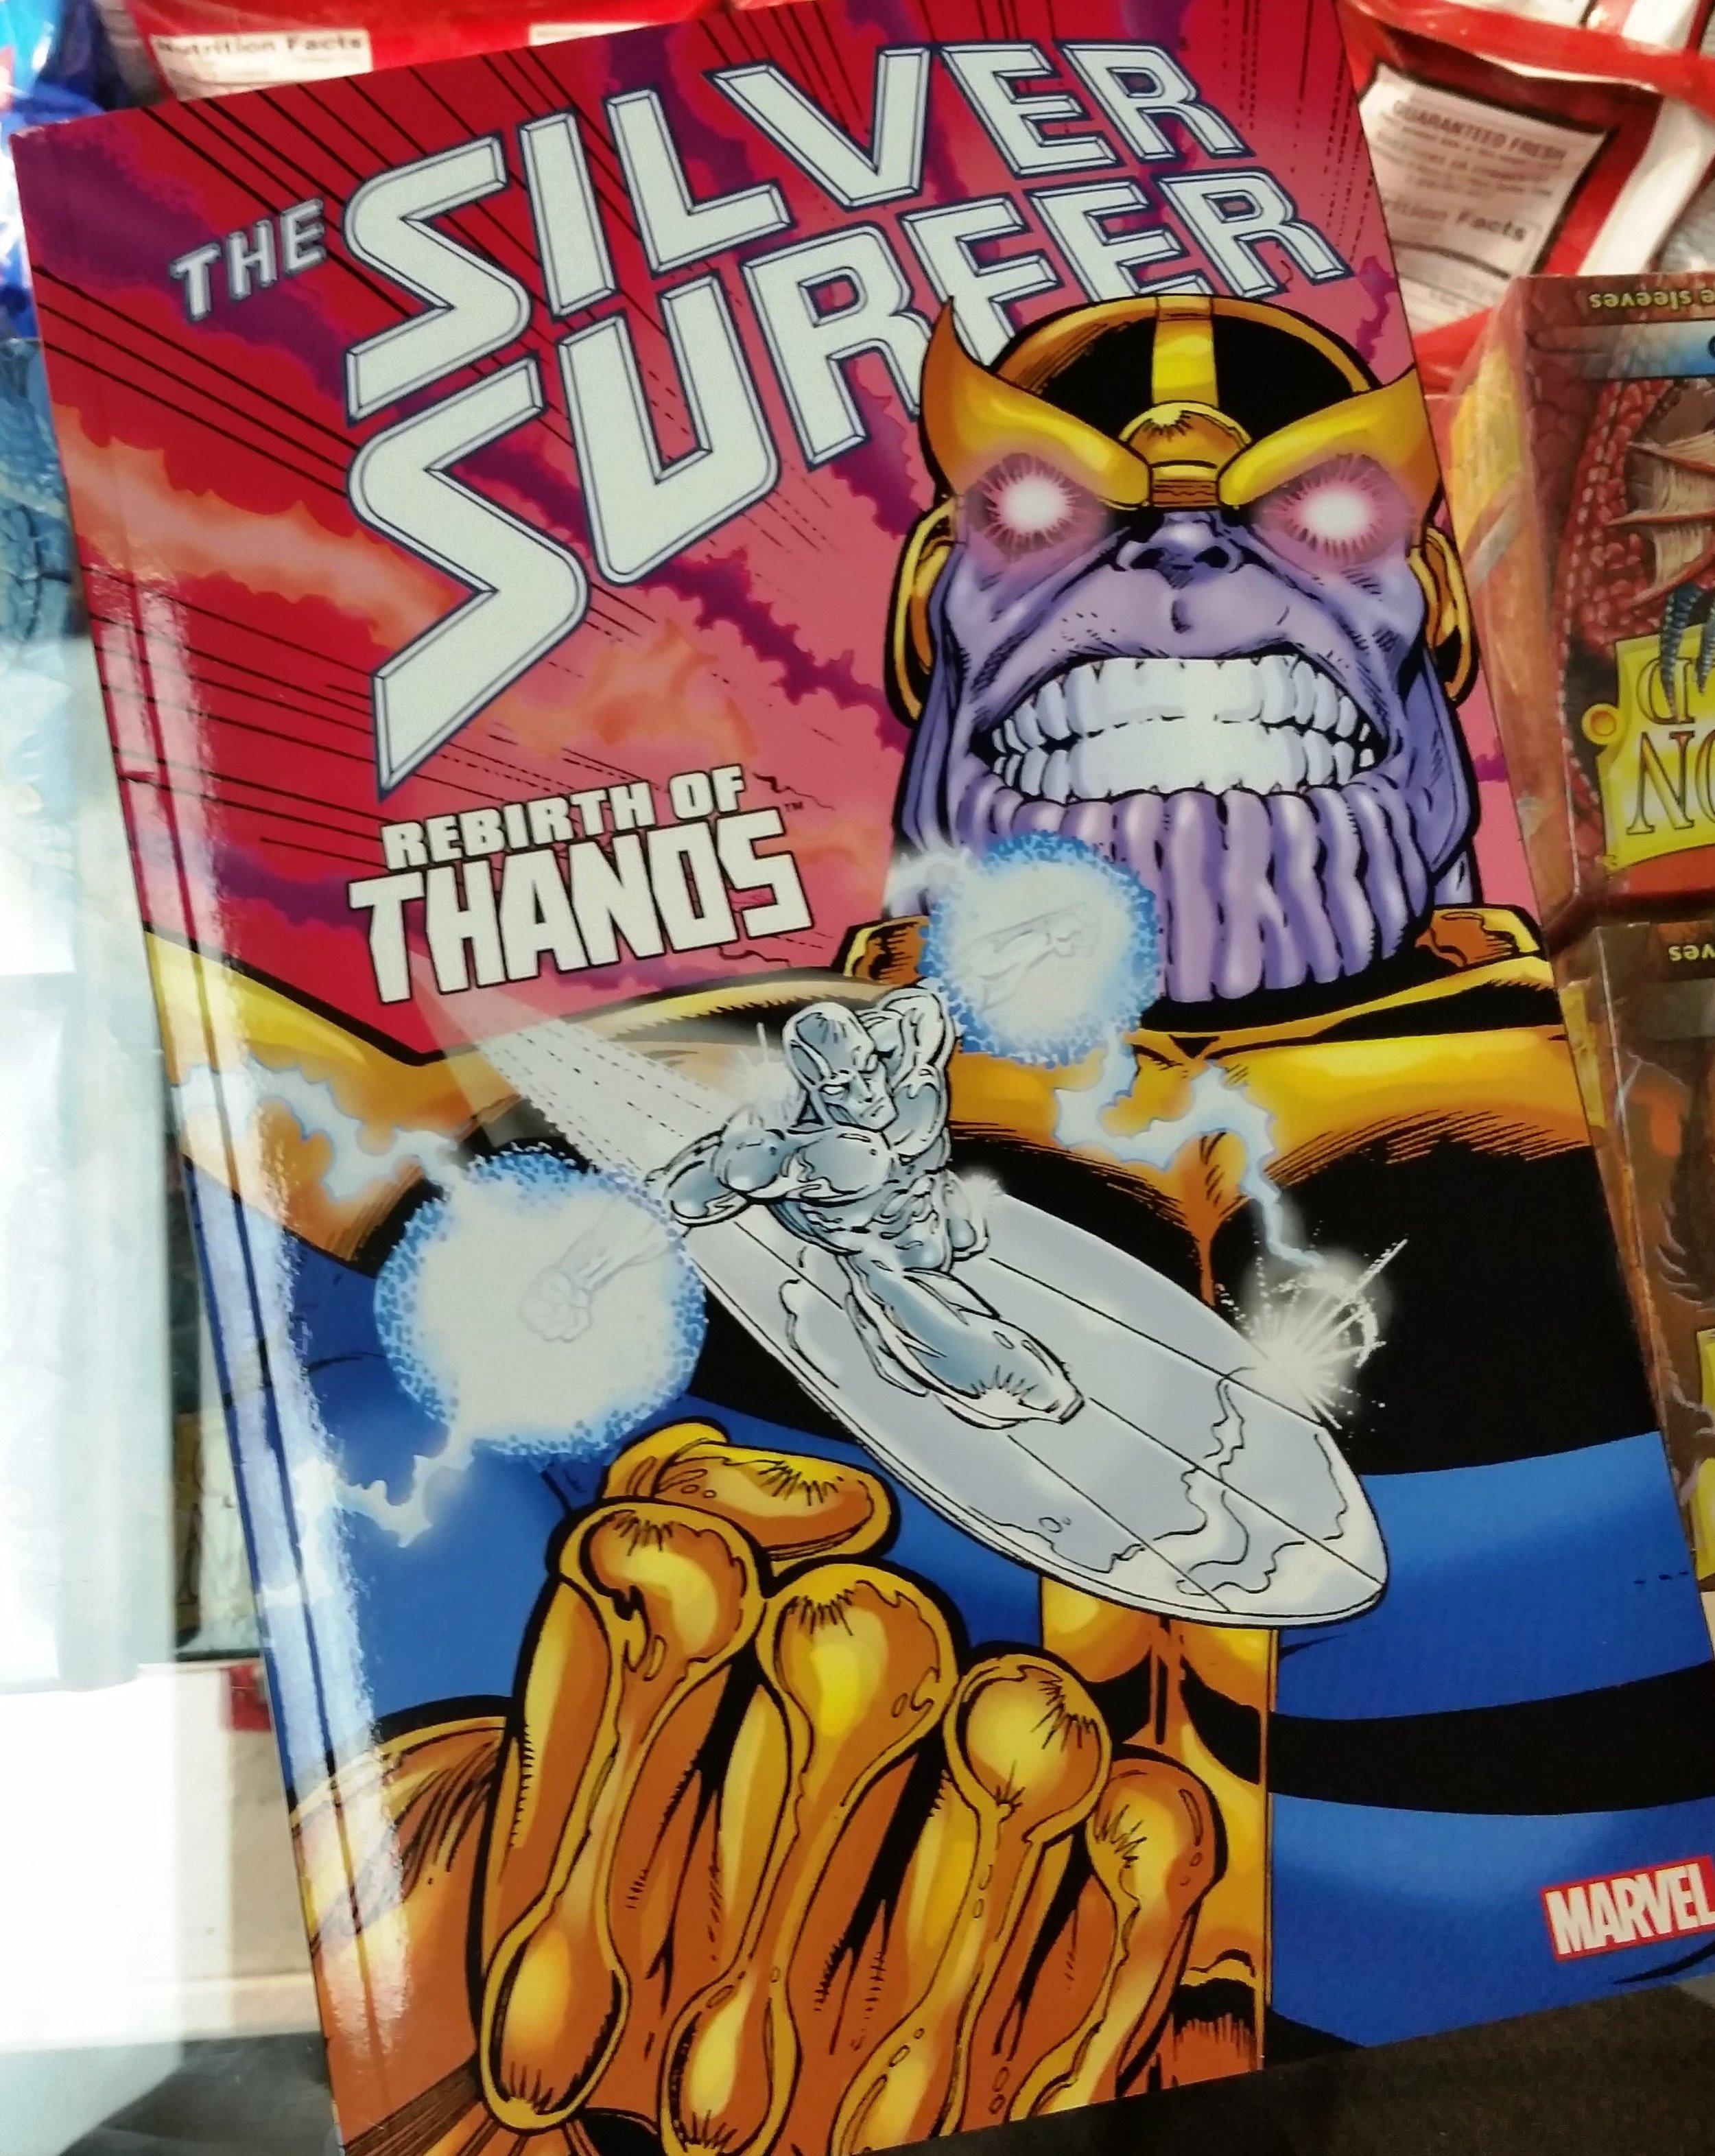 Silver Surfer: Rebirth of Thanos - By Jim Starlin (DC)